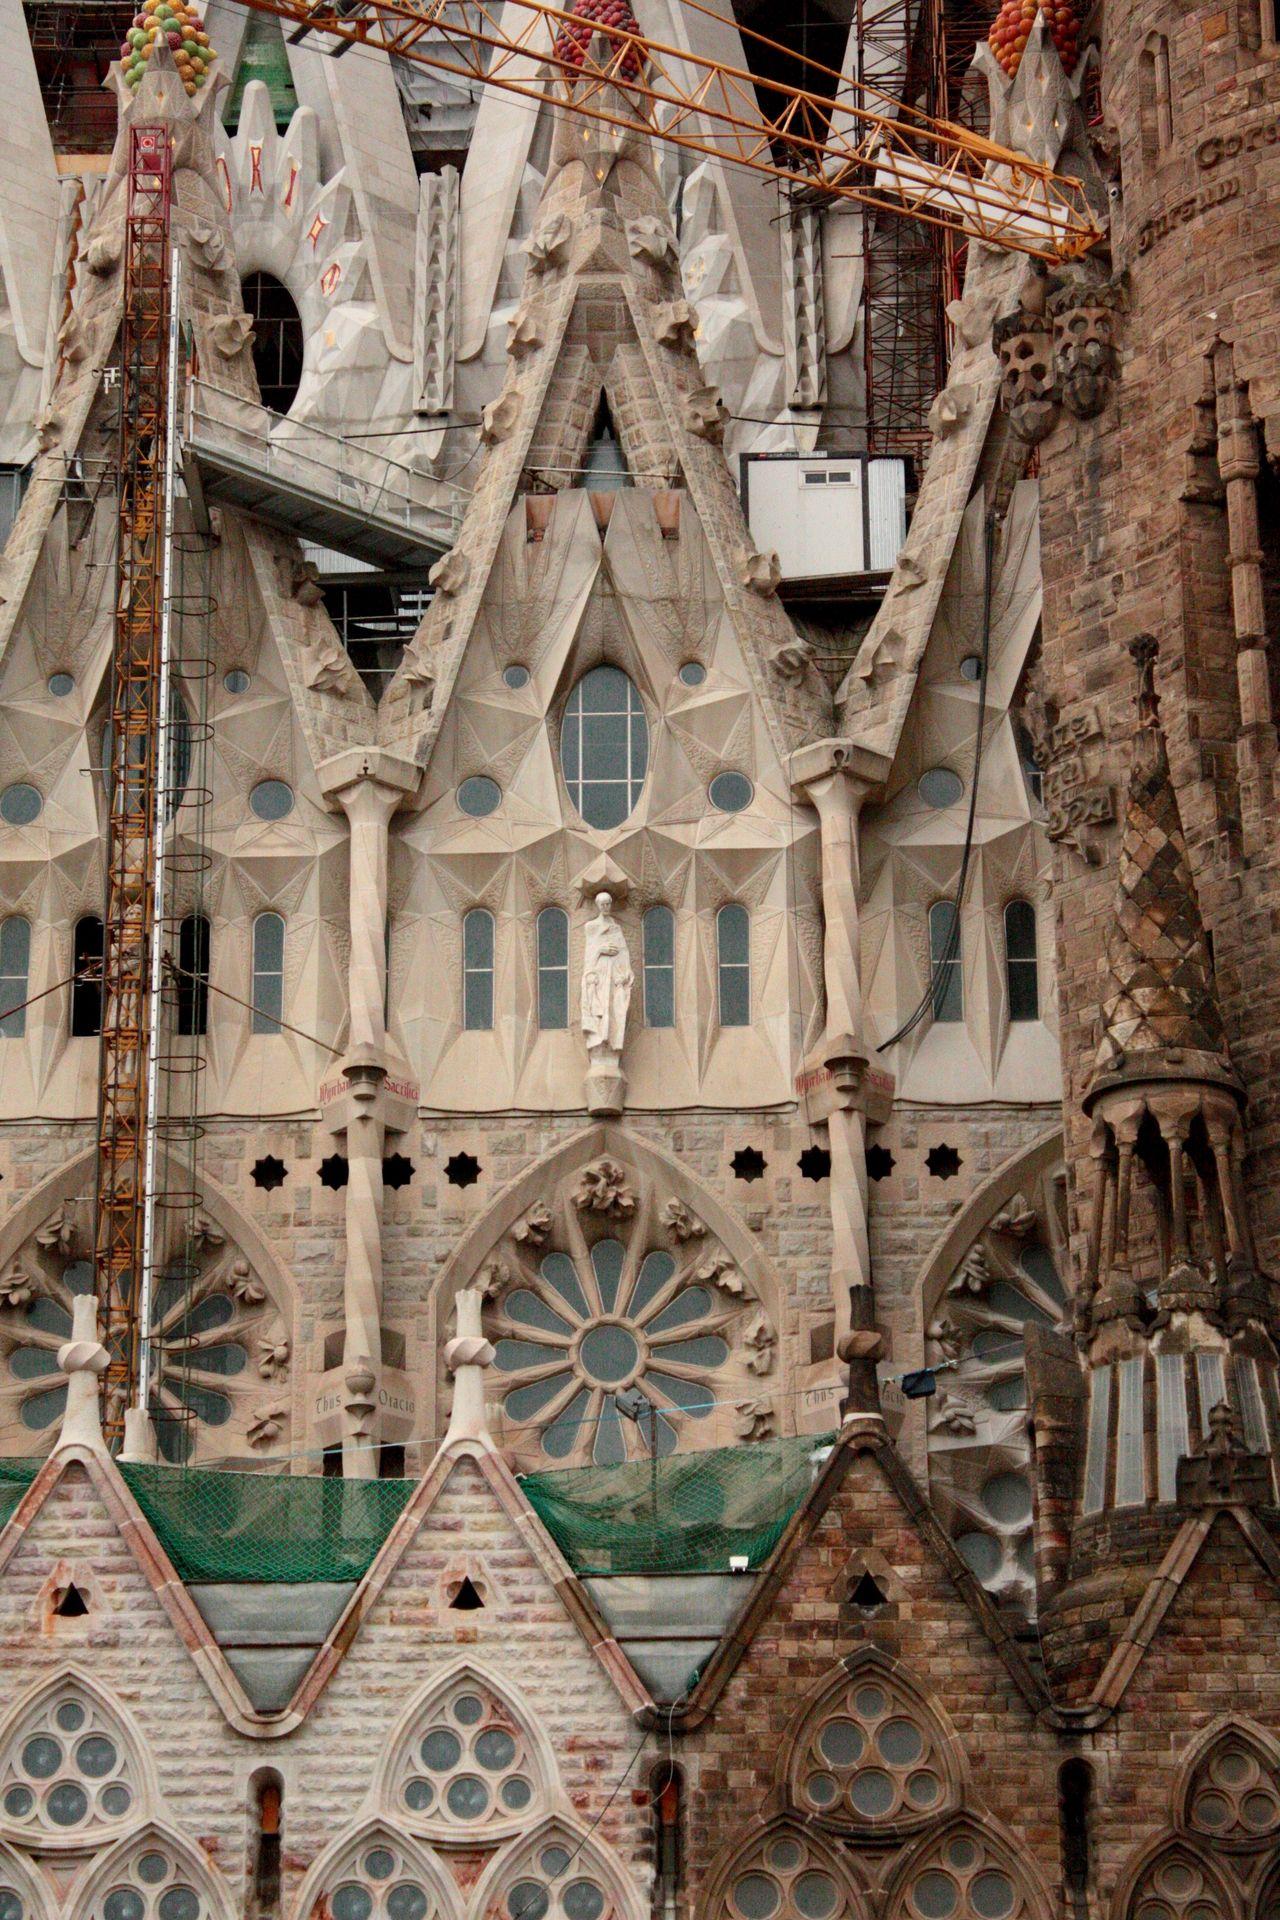 Architectural Detail Architecture Architecture Astronomical Clock Astronomy Barcelona Barcelona, Spain Building Exterior Building Site Built Structure Clock Clock Tower Construction Construction Work Day No People Outdoors Sagrada Familia Sky Time